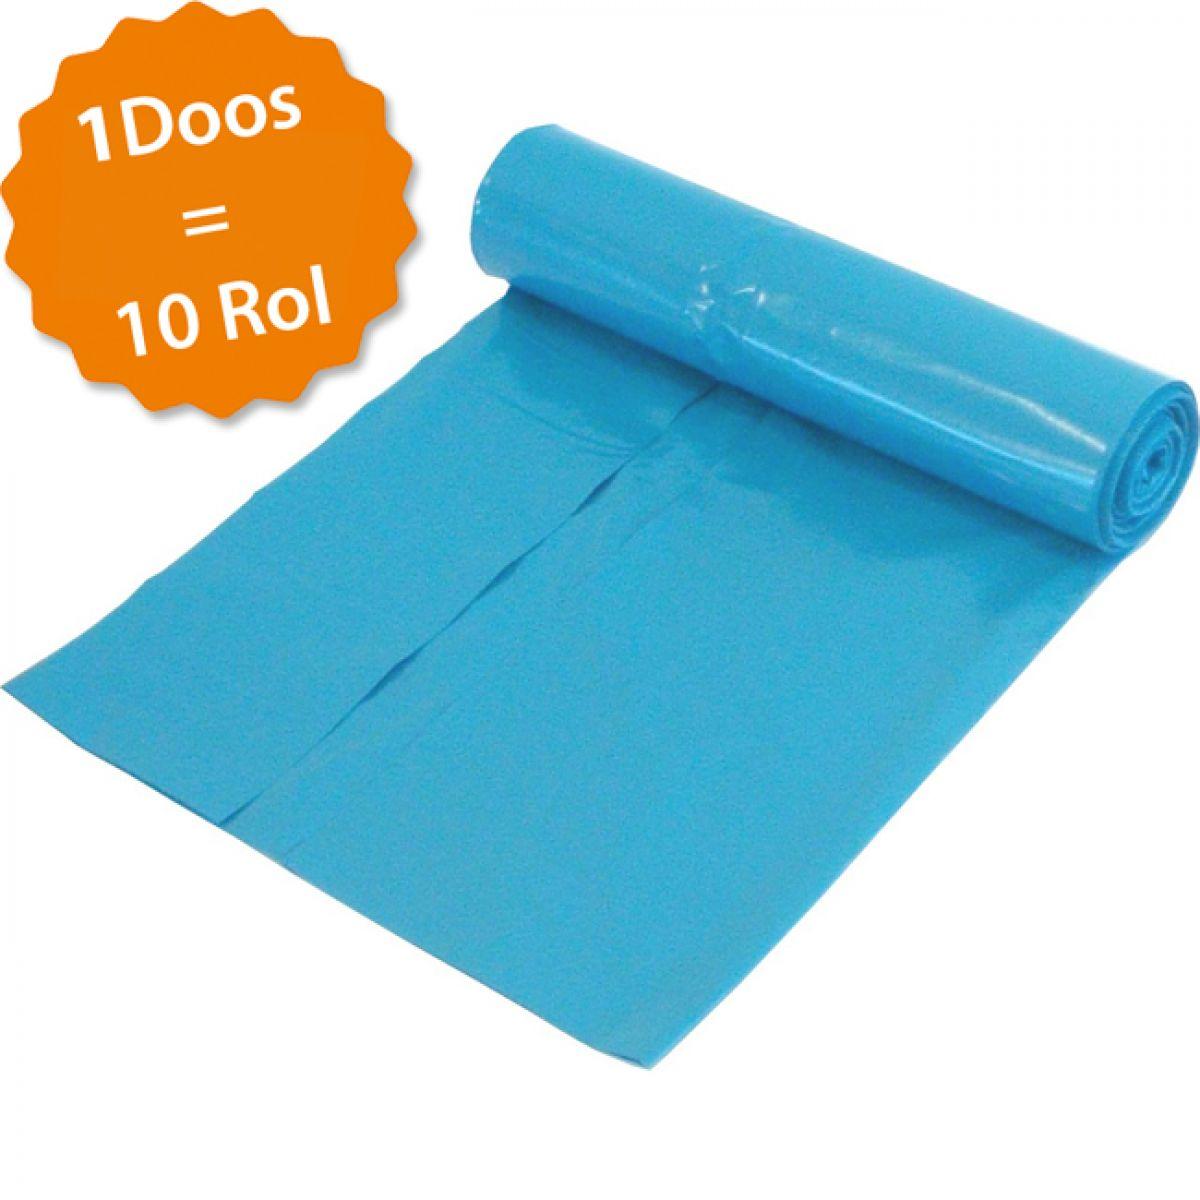 Rol vuilniszakken 70x110 cm 20 st per rol kleur:blauw  doos